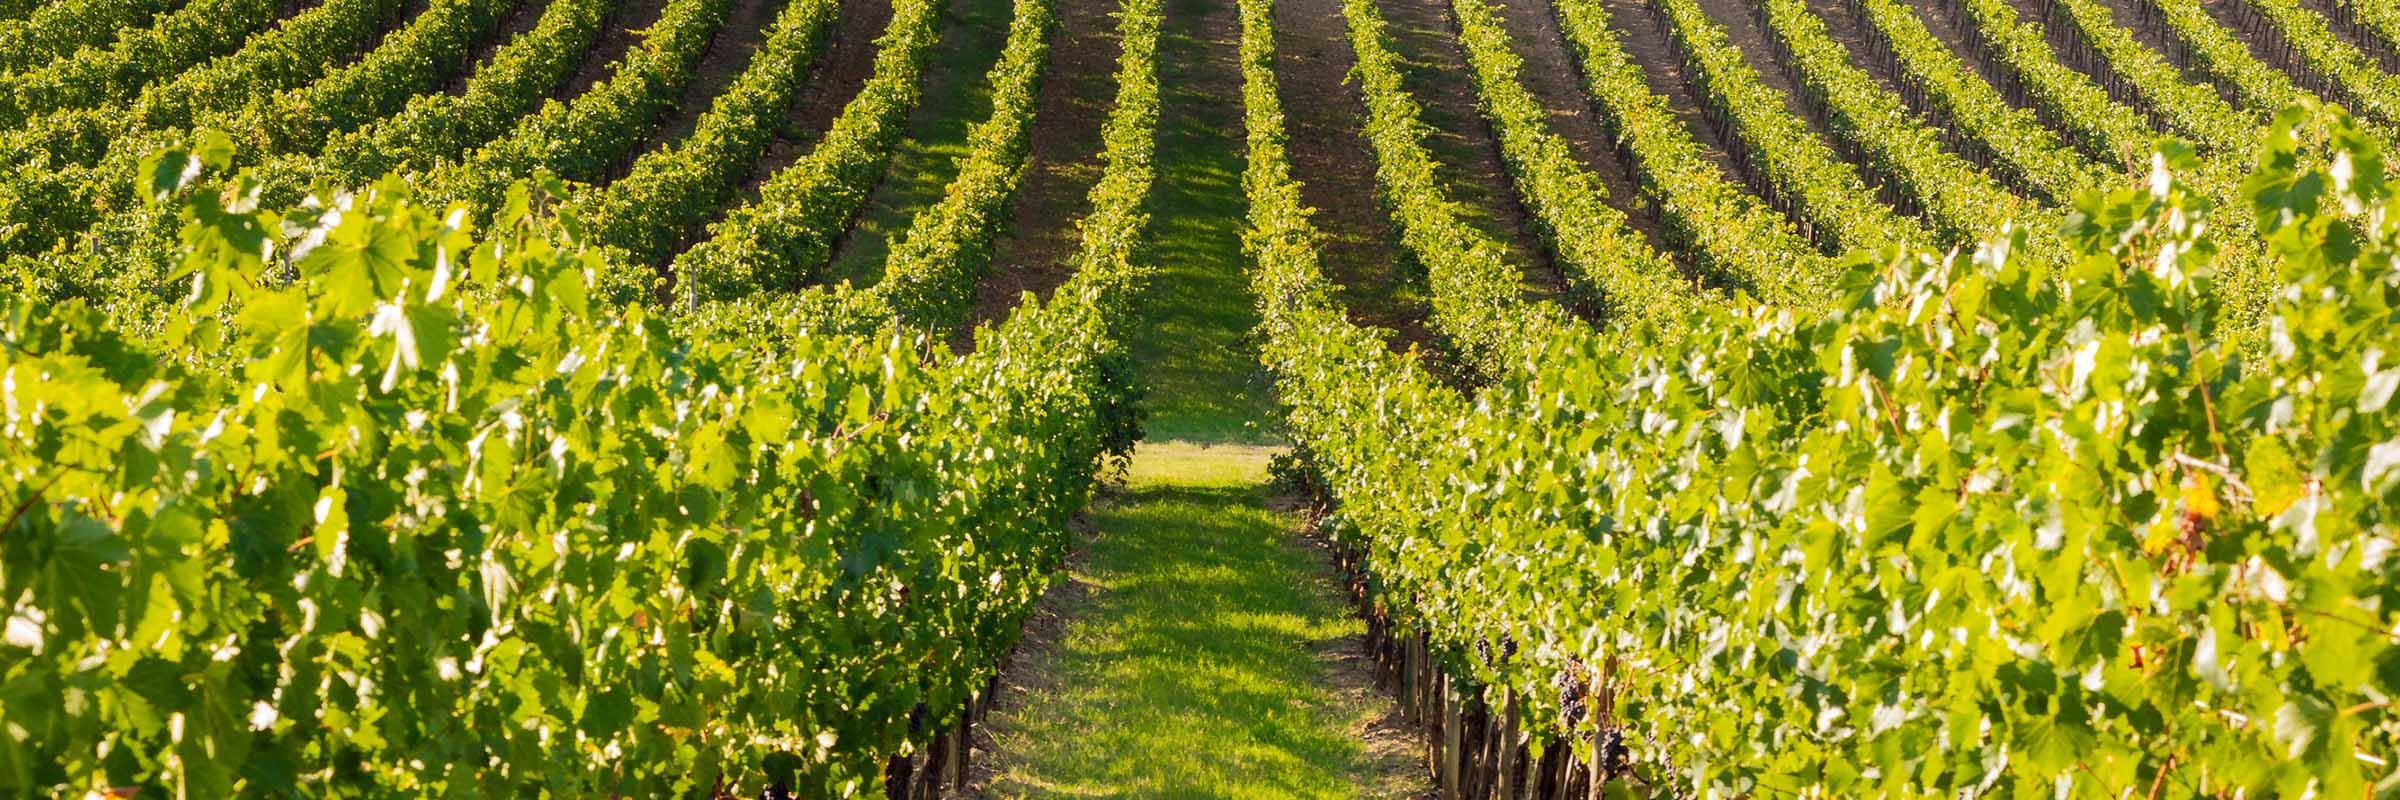 wine country cocktail vineyard grape vines boutique hunter valley pokolbin lovedale